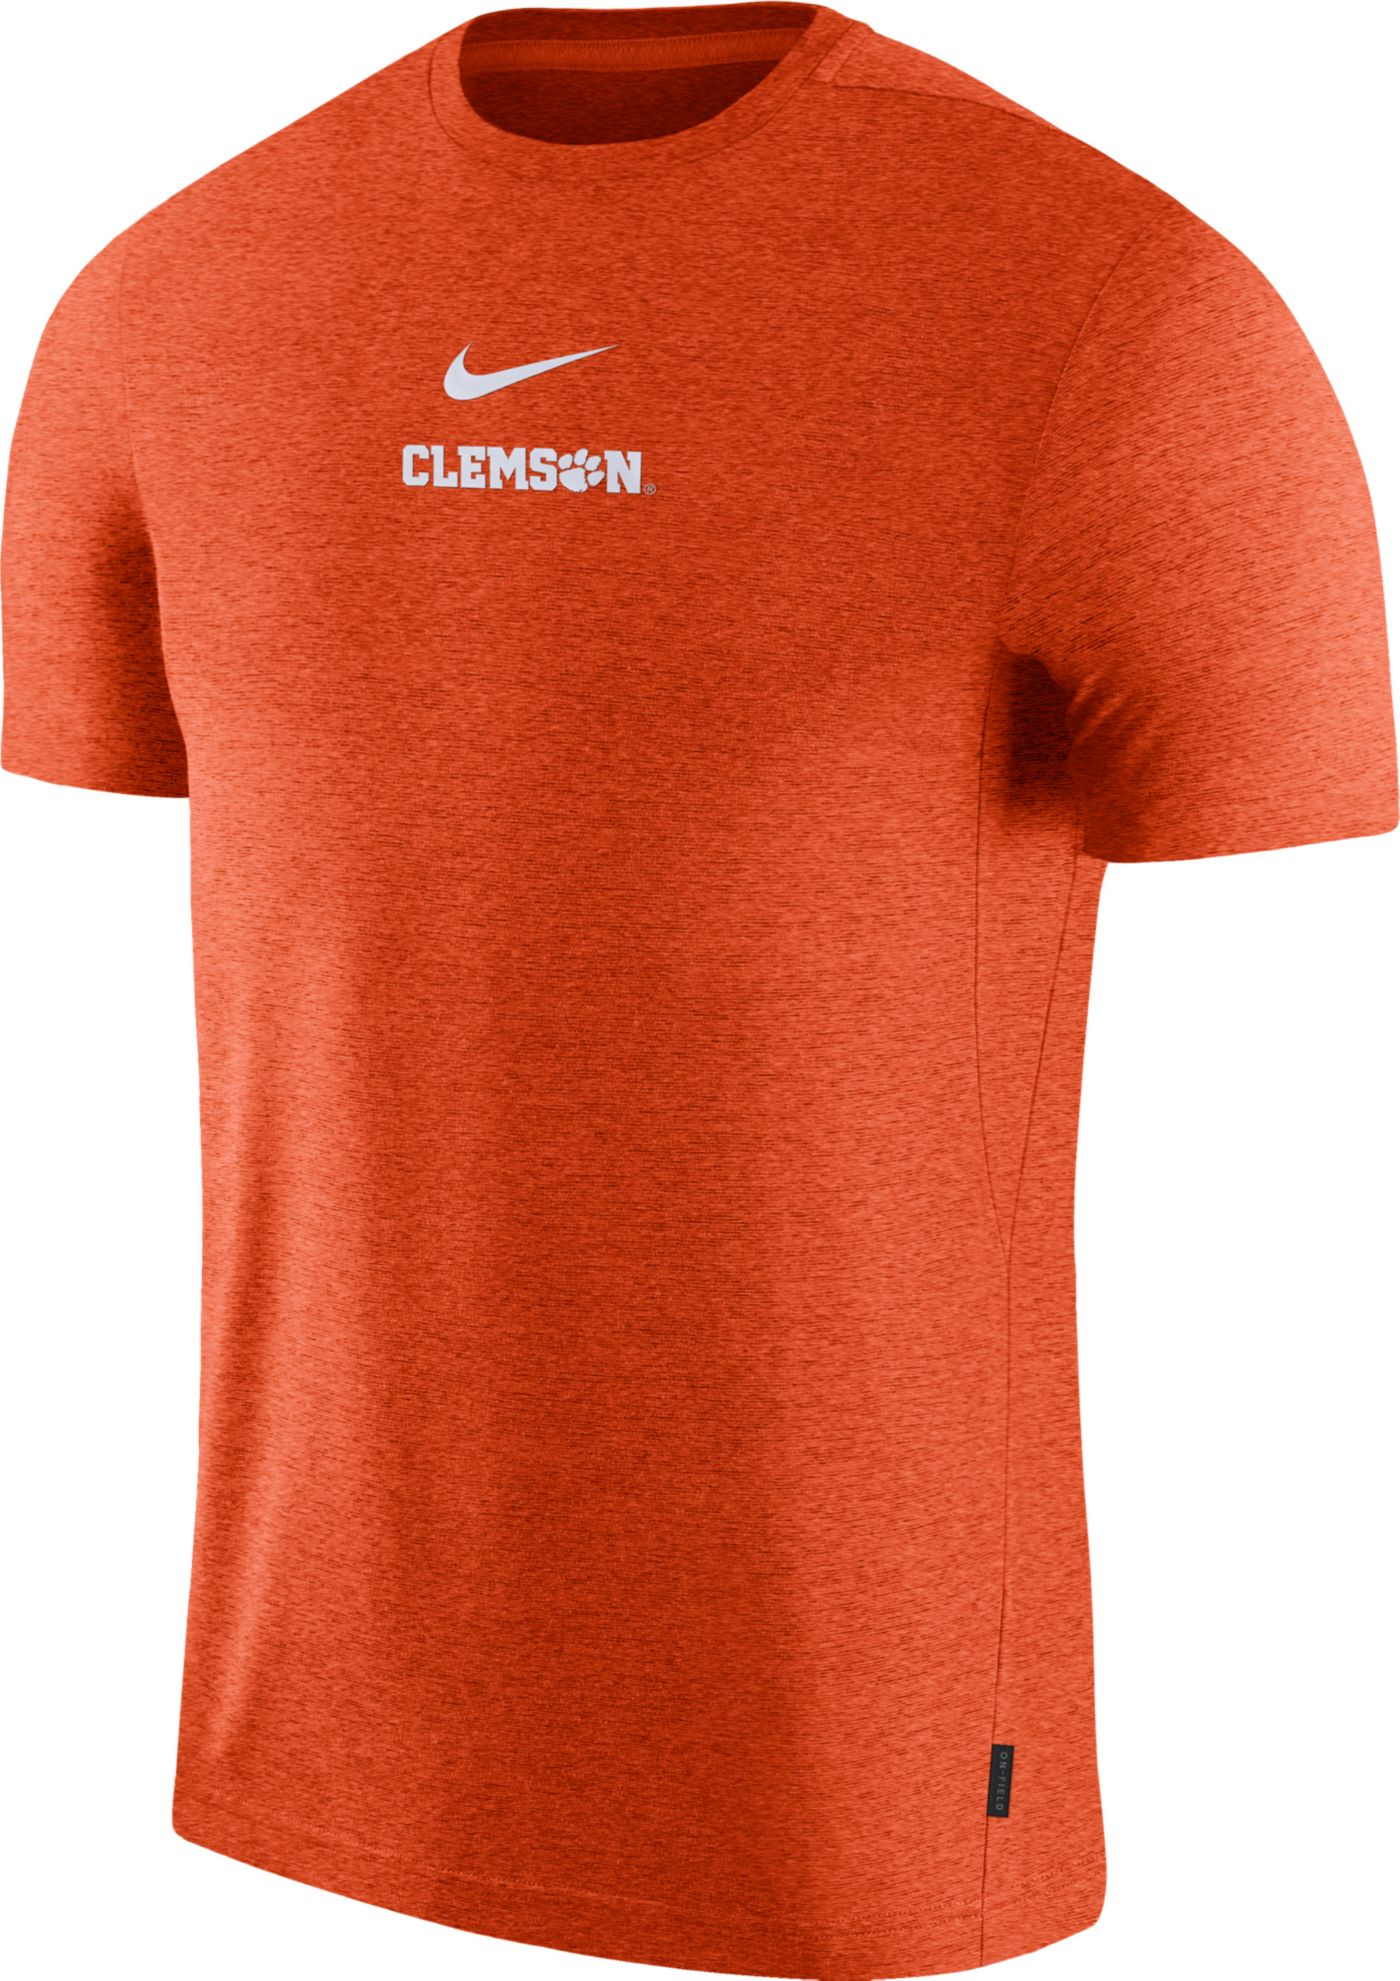 Nike Men's Clemson Tigers Orange Dri-FIT Coach UV Football T-Shirt